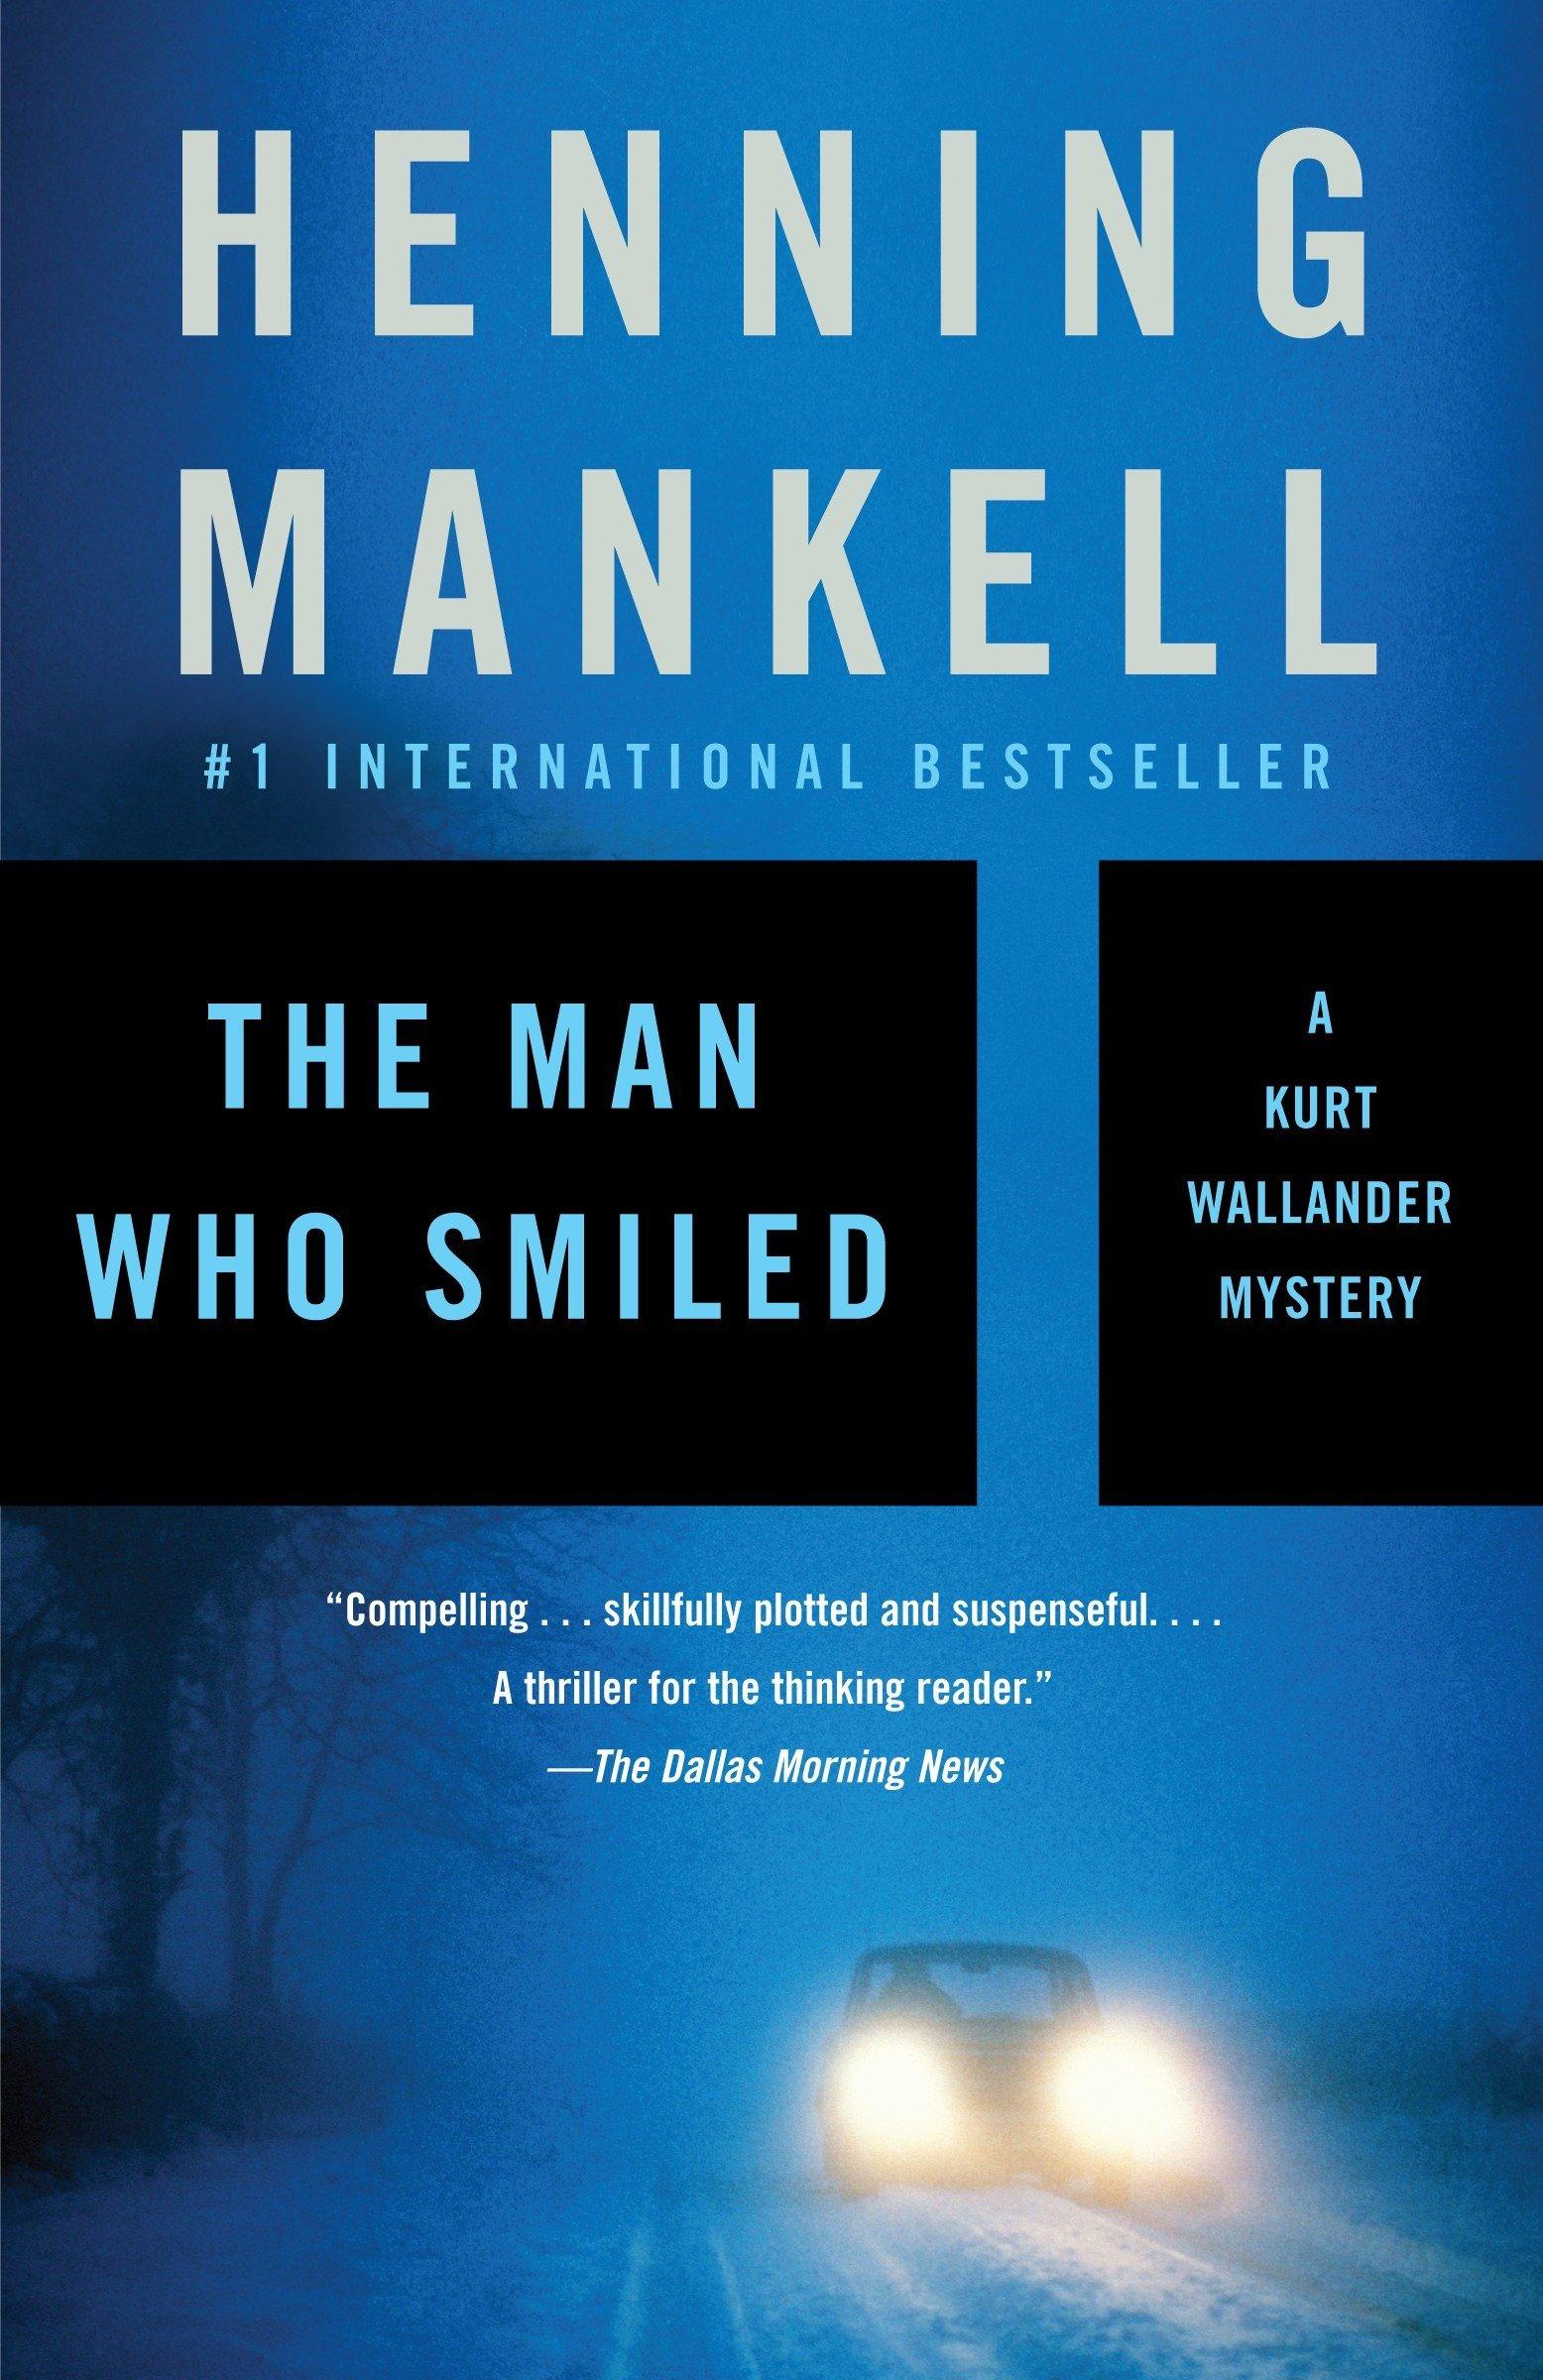 The Man Who Smiled (Kurt Wallander Series) by Vintage Crime/Black Lizard